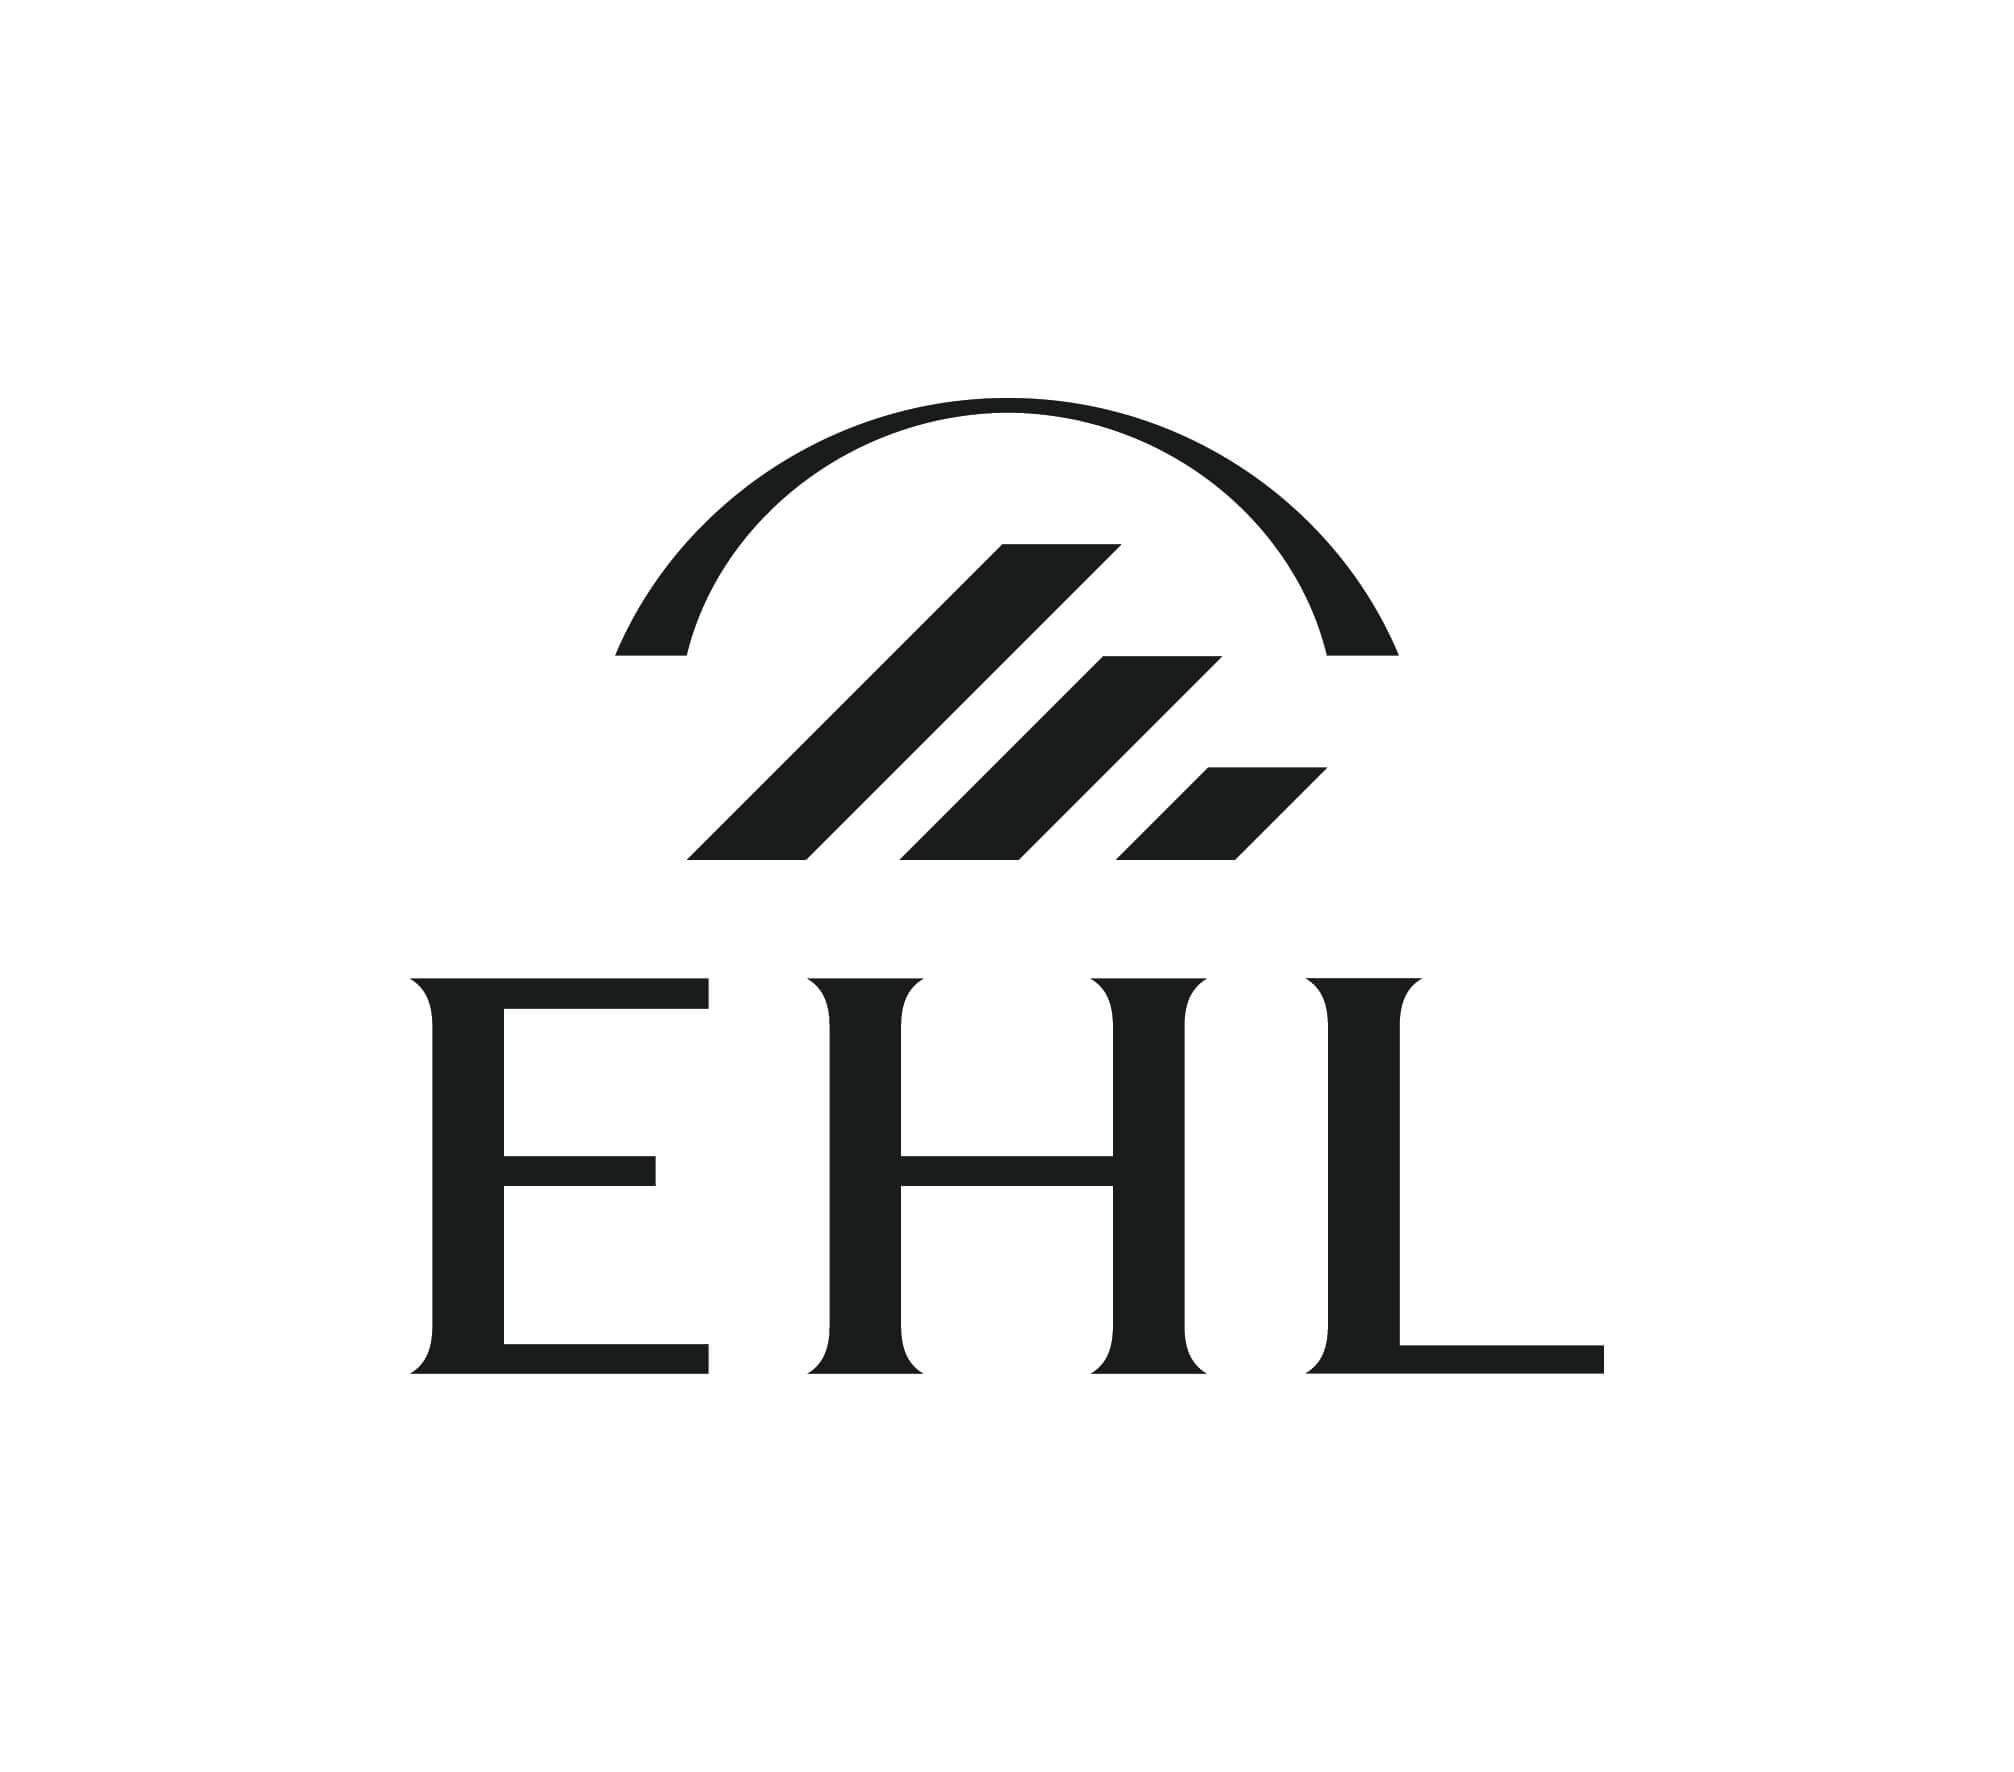 Ehl logo simple stacked cmyk print black